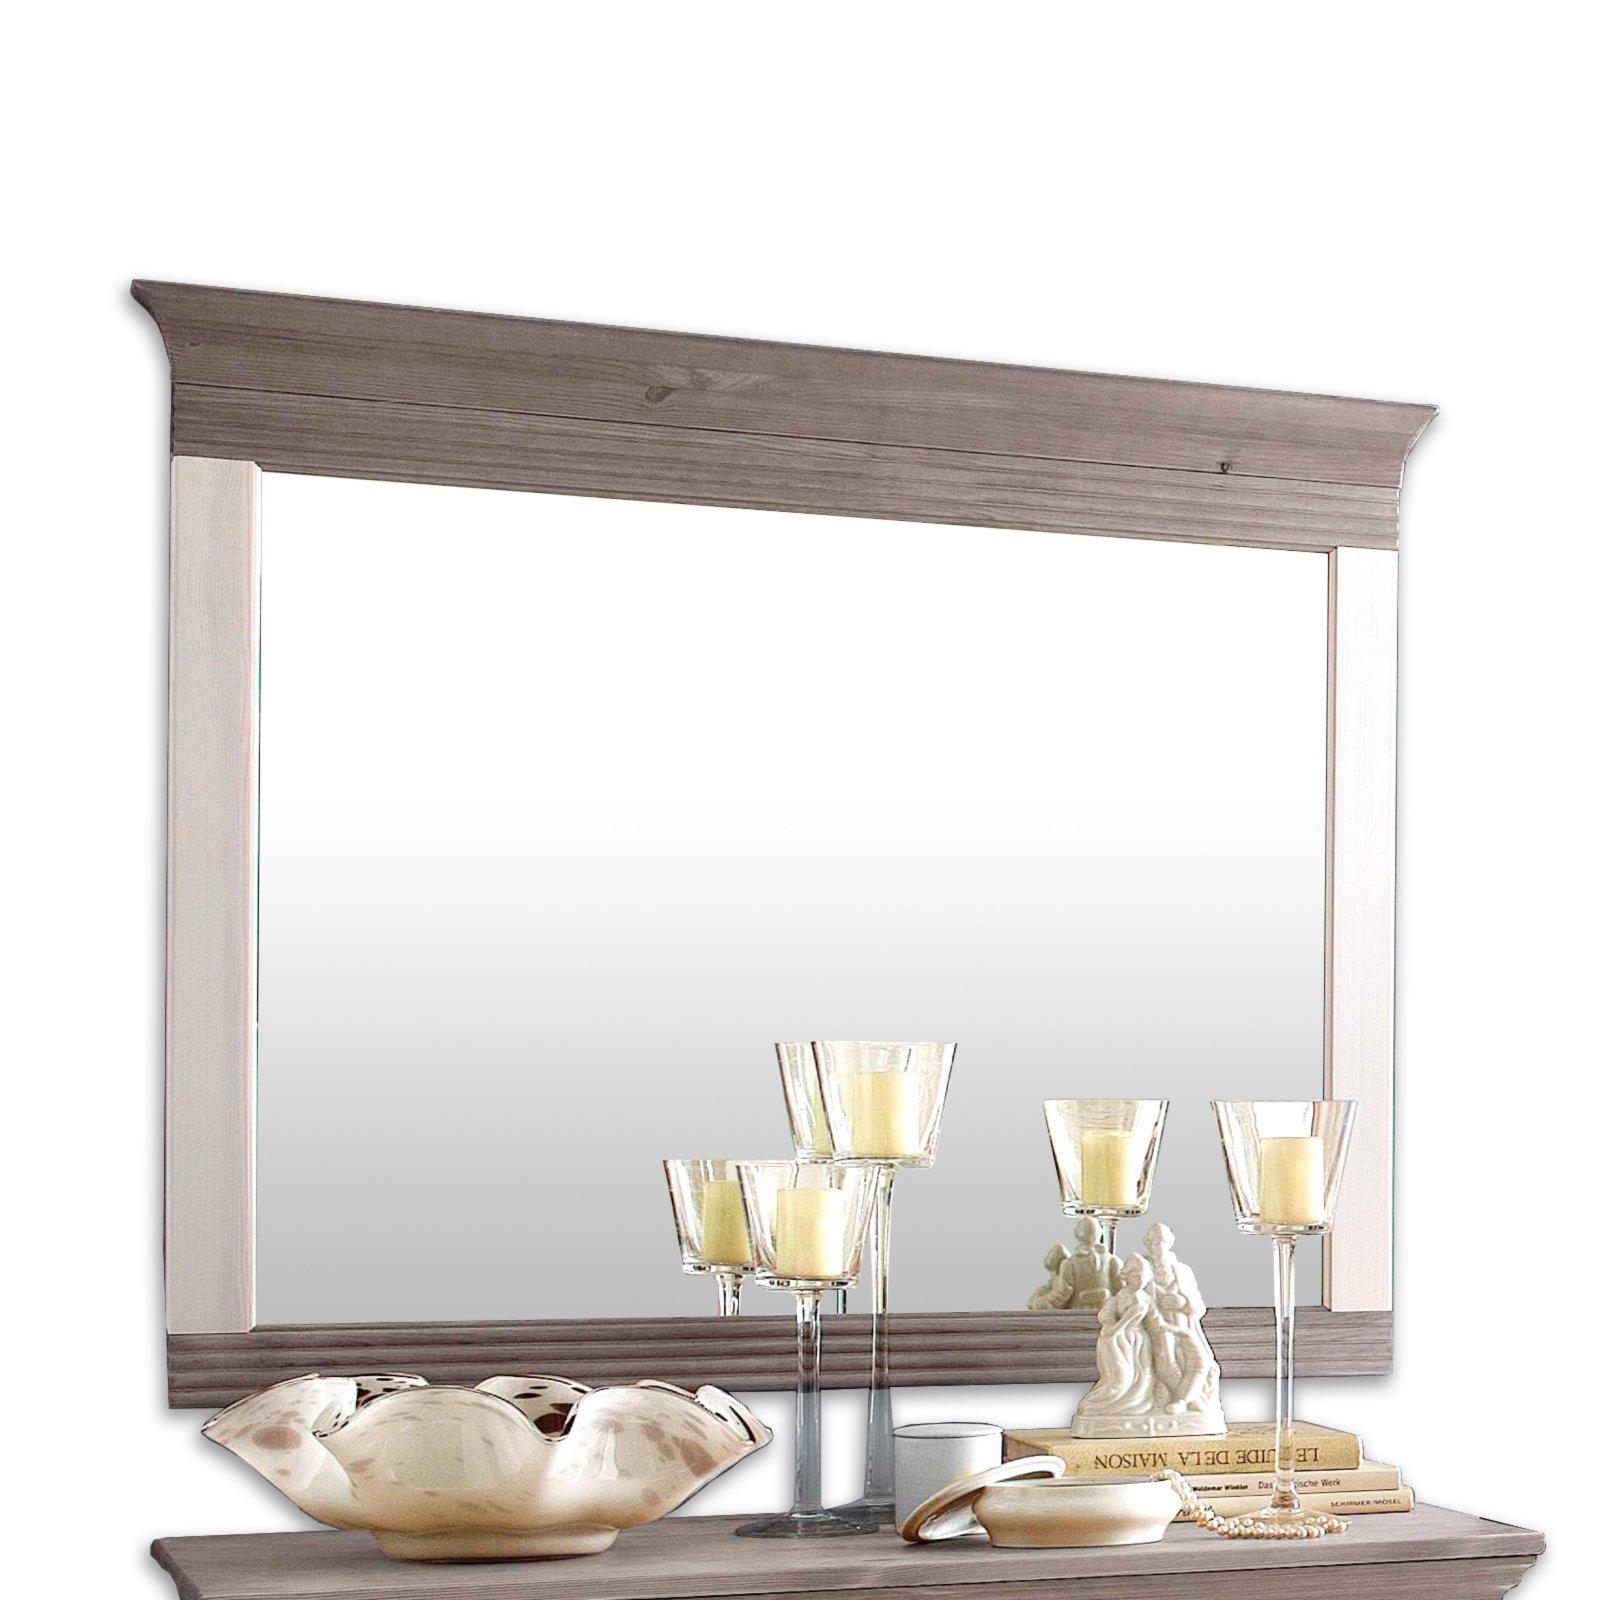 spiegel oslo wandspiegel spiegel deko haushalt roller. Black Bedroom Furniture Sets. Home Design Ideas